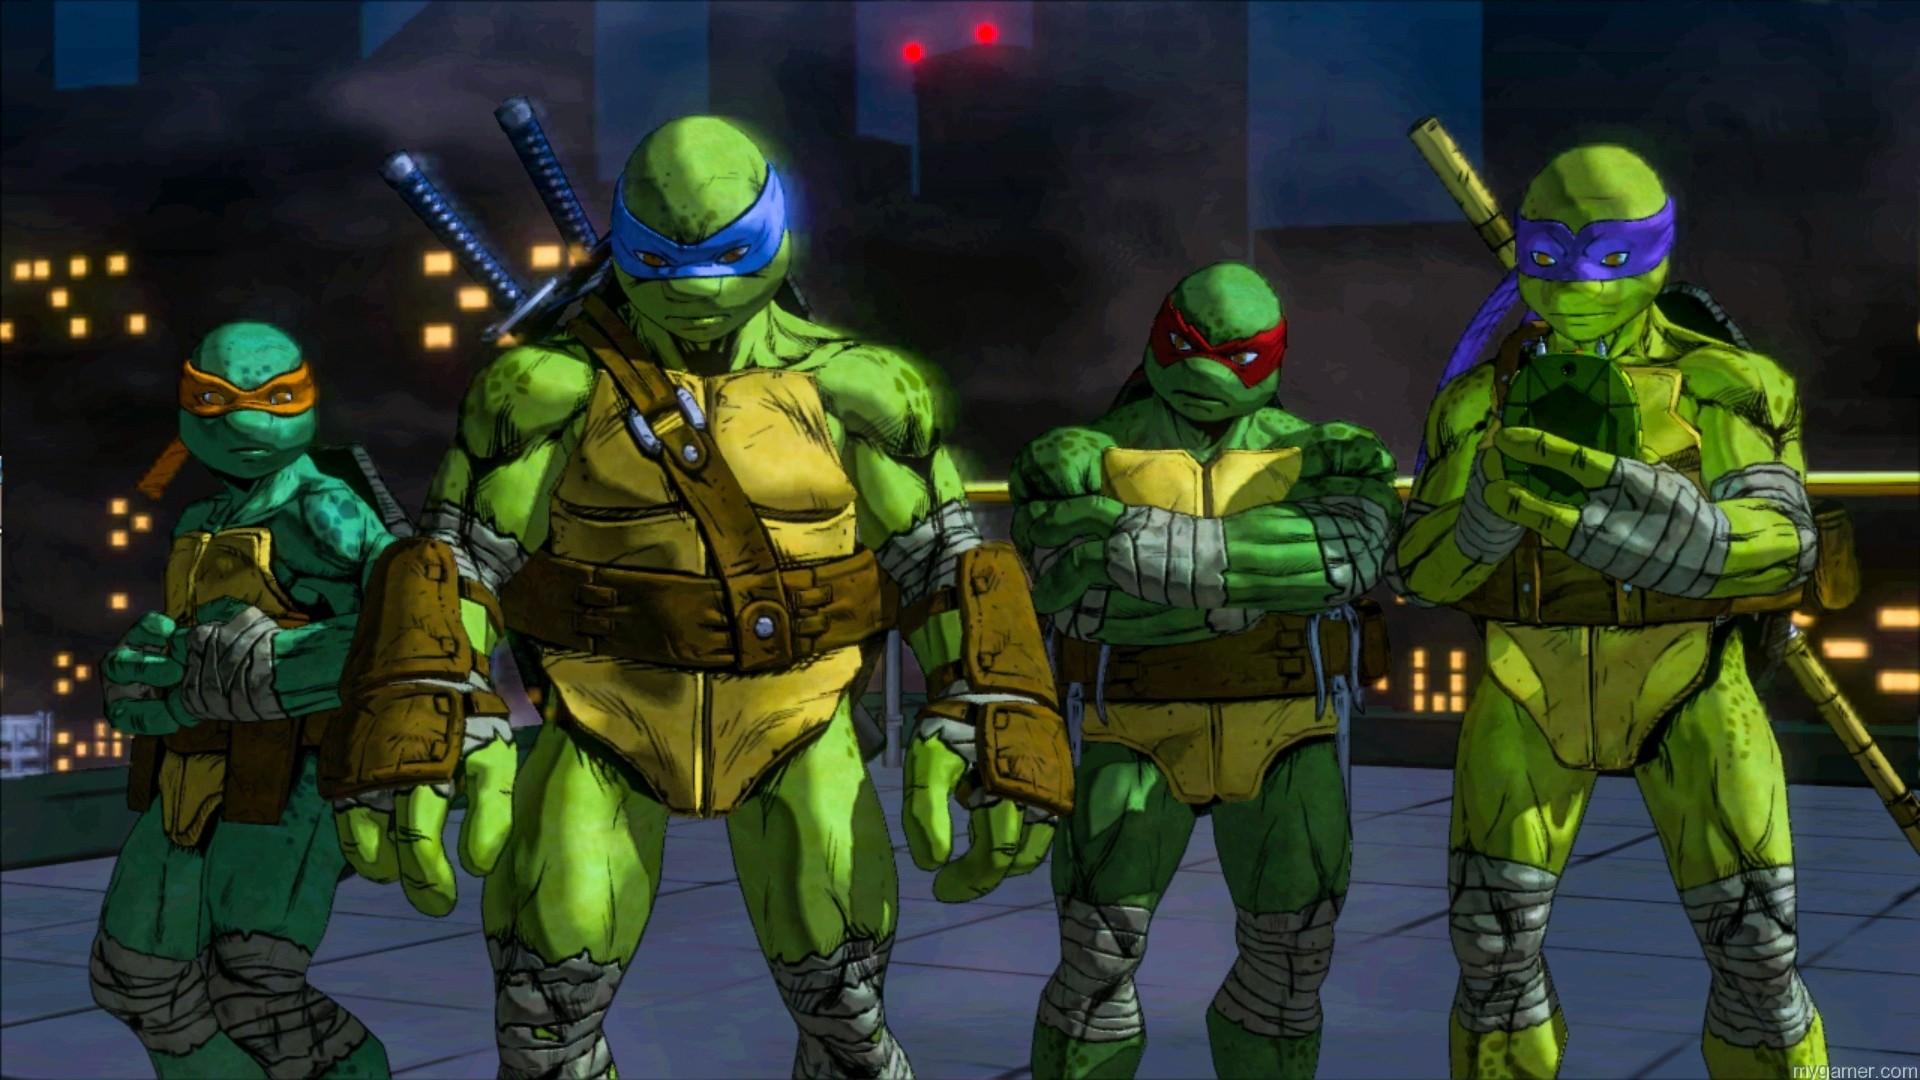 Teenage Mutant Ninja Turtles: Out of the Shadows Super Bowl Spot!